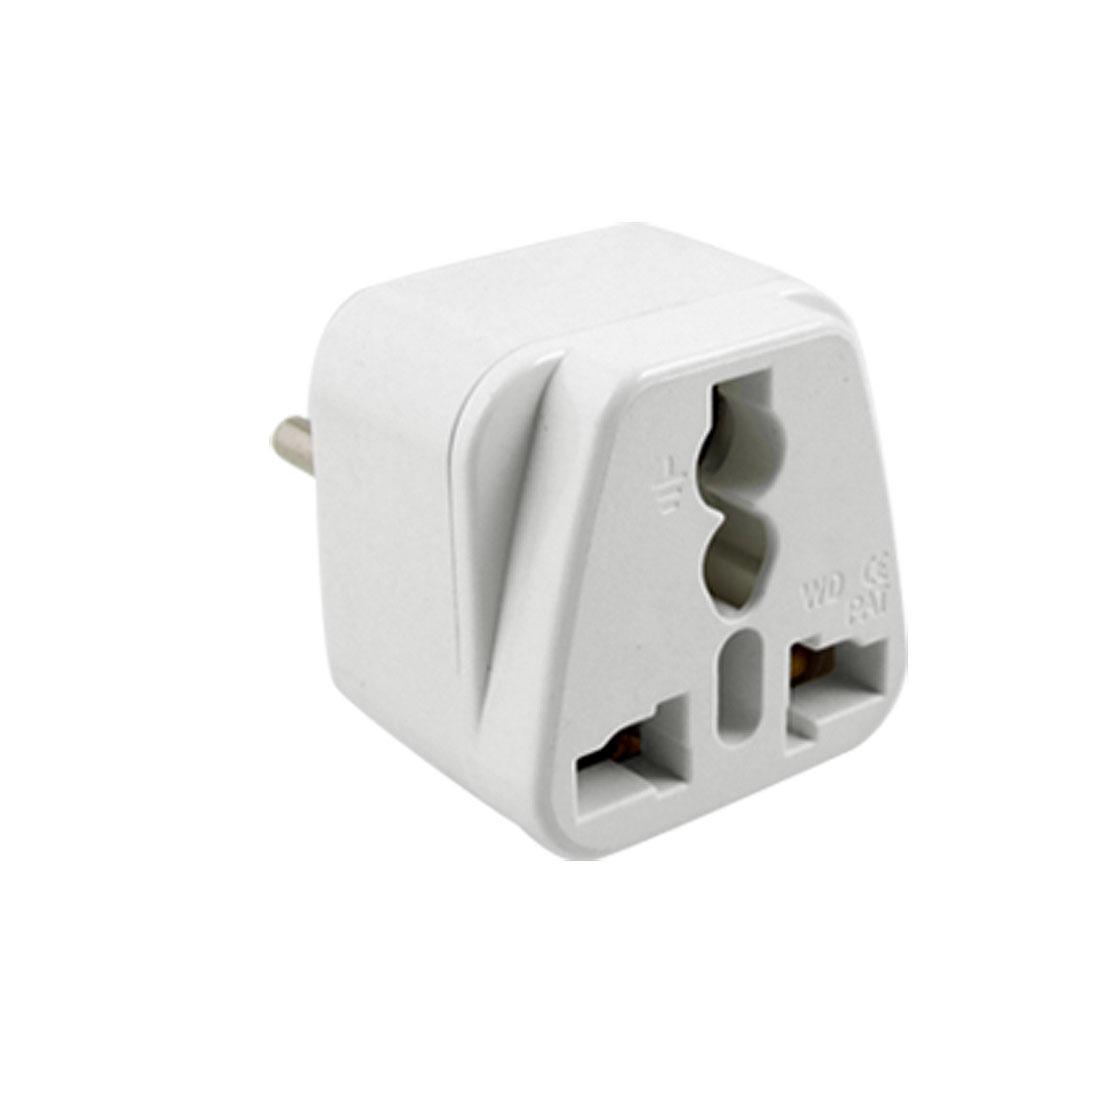 3-Pin Italy Type Plug to UK US AC 250V Travel Power Adapter